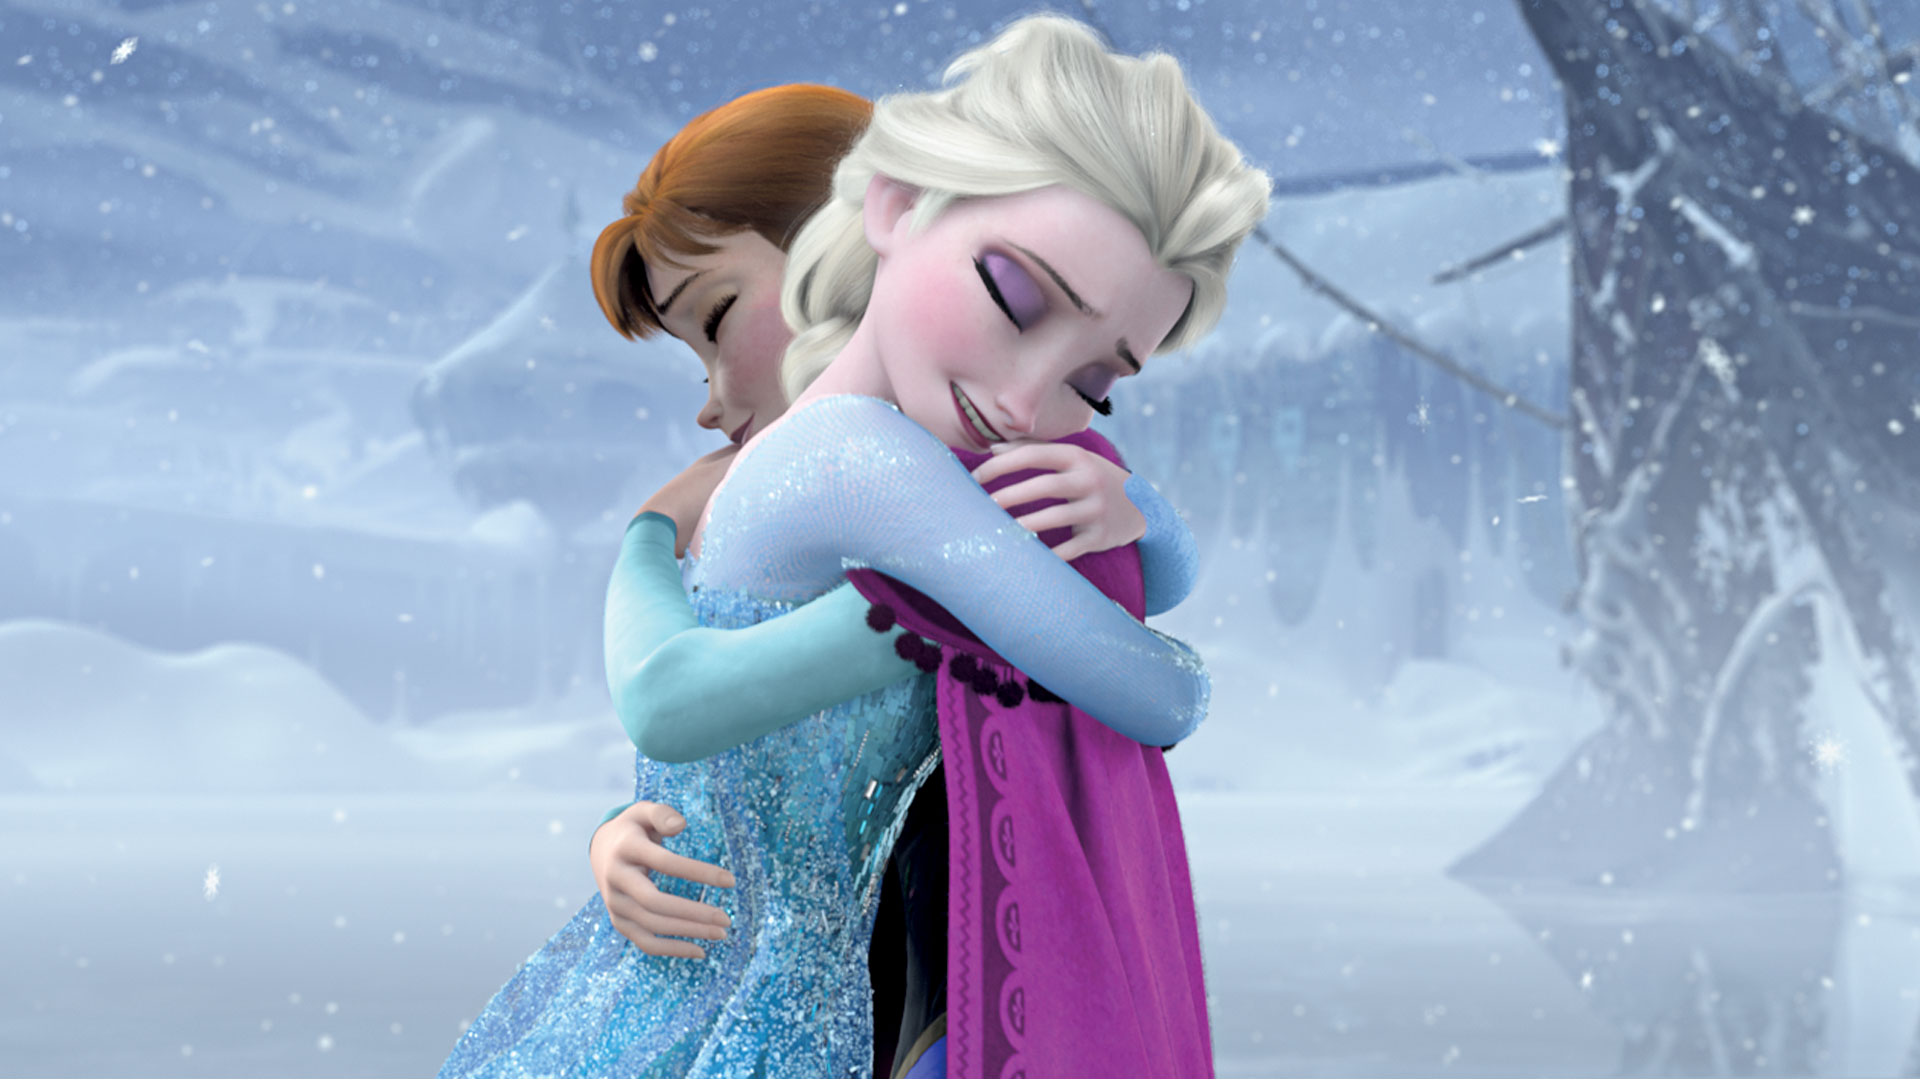 Elsa And Anna Hd Wallpaper Hintergrund 1920x1080 Id552644